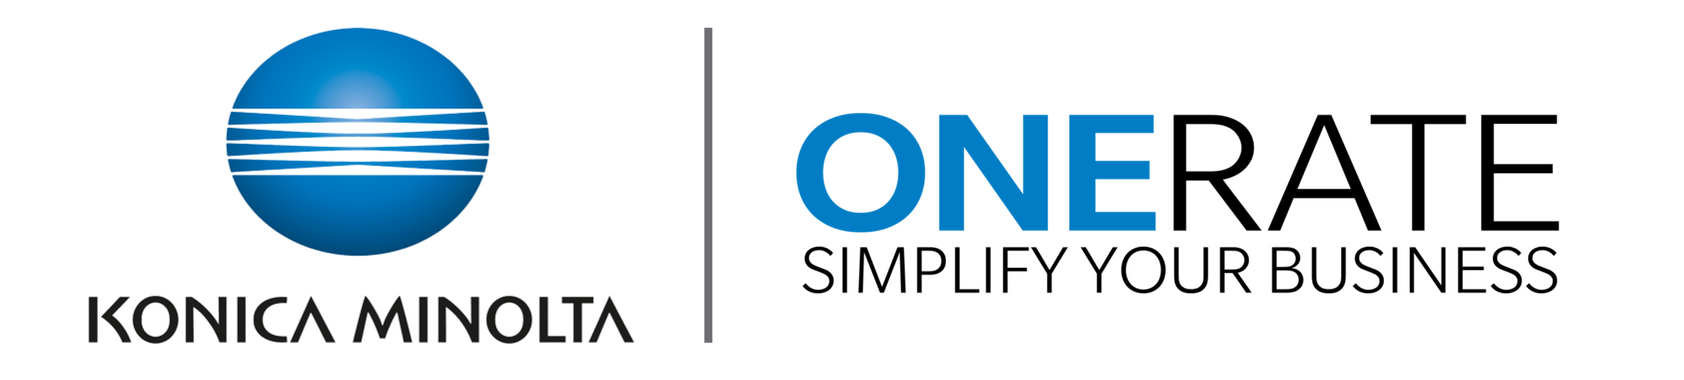 Konica Minolta Presents OneRate